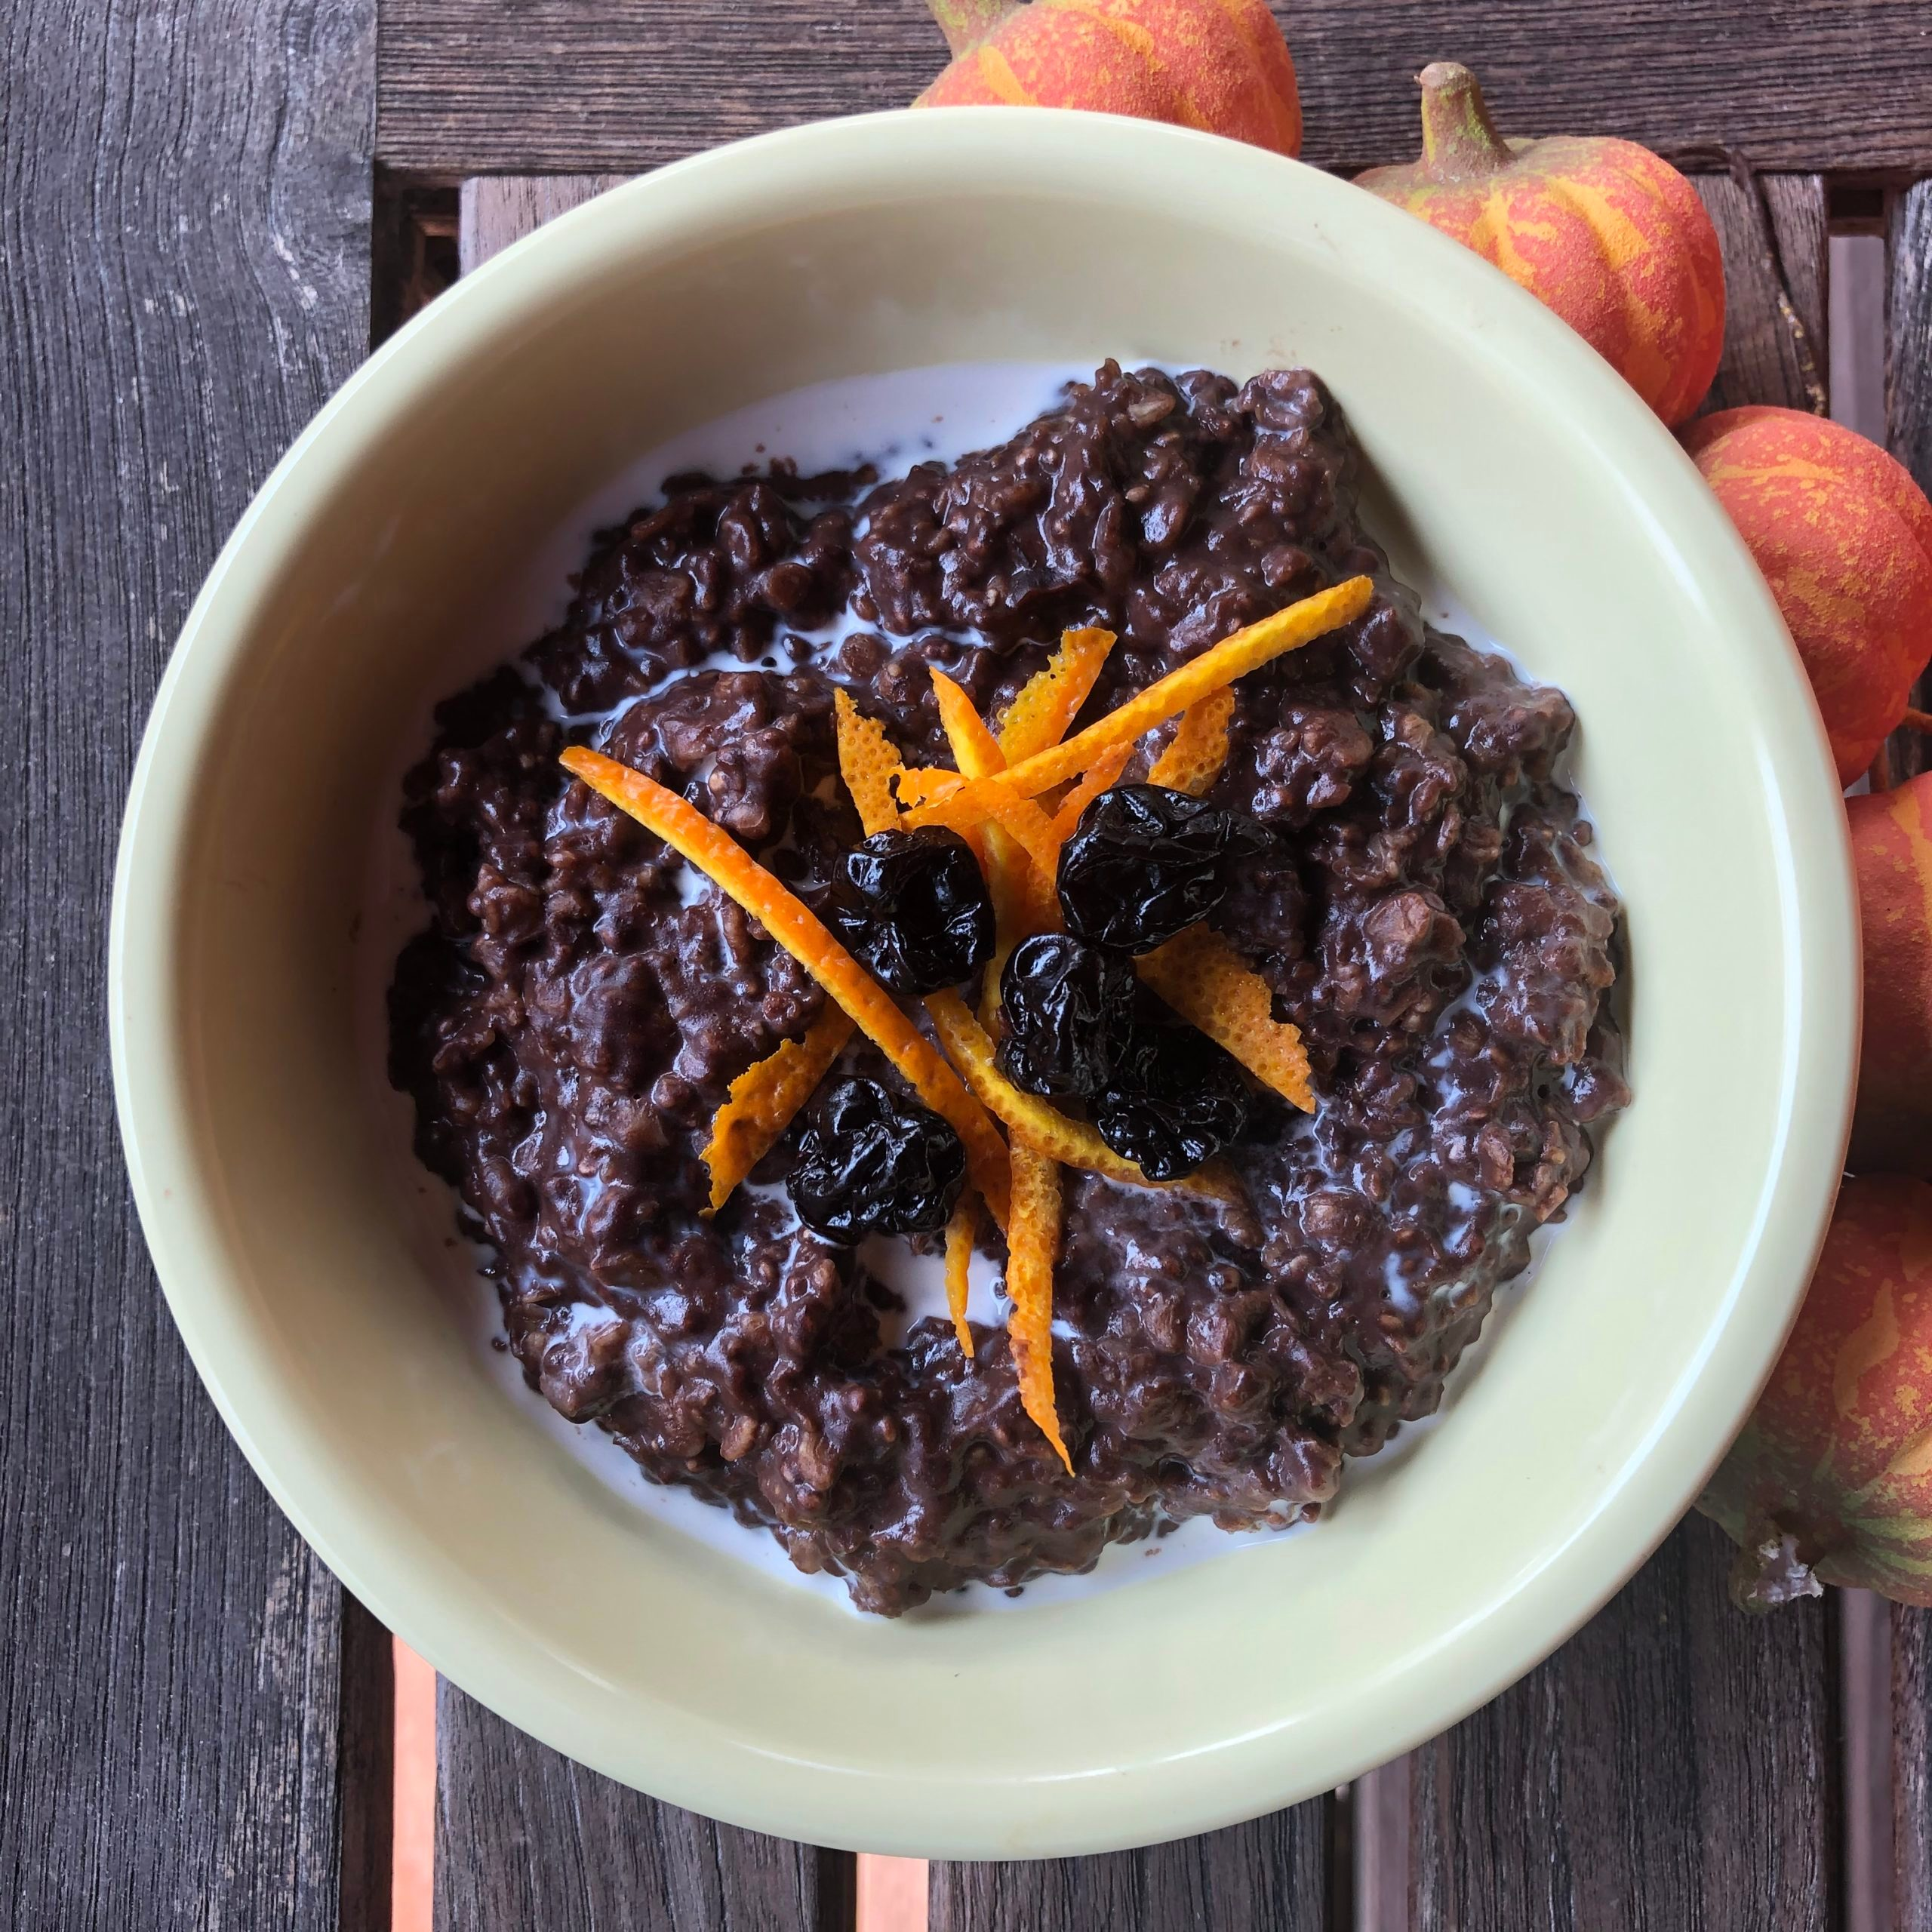 cherry chocolate chia oatmeal from susan bowerman